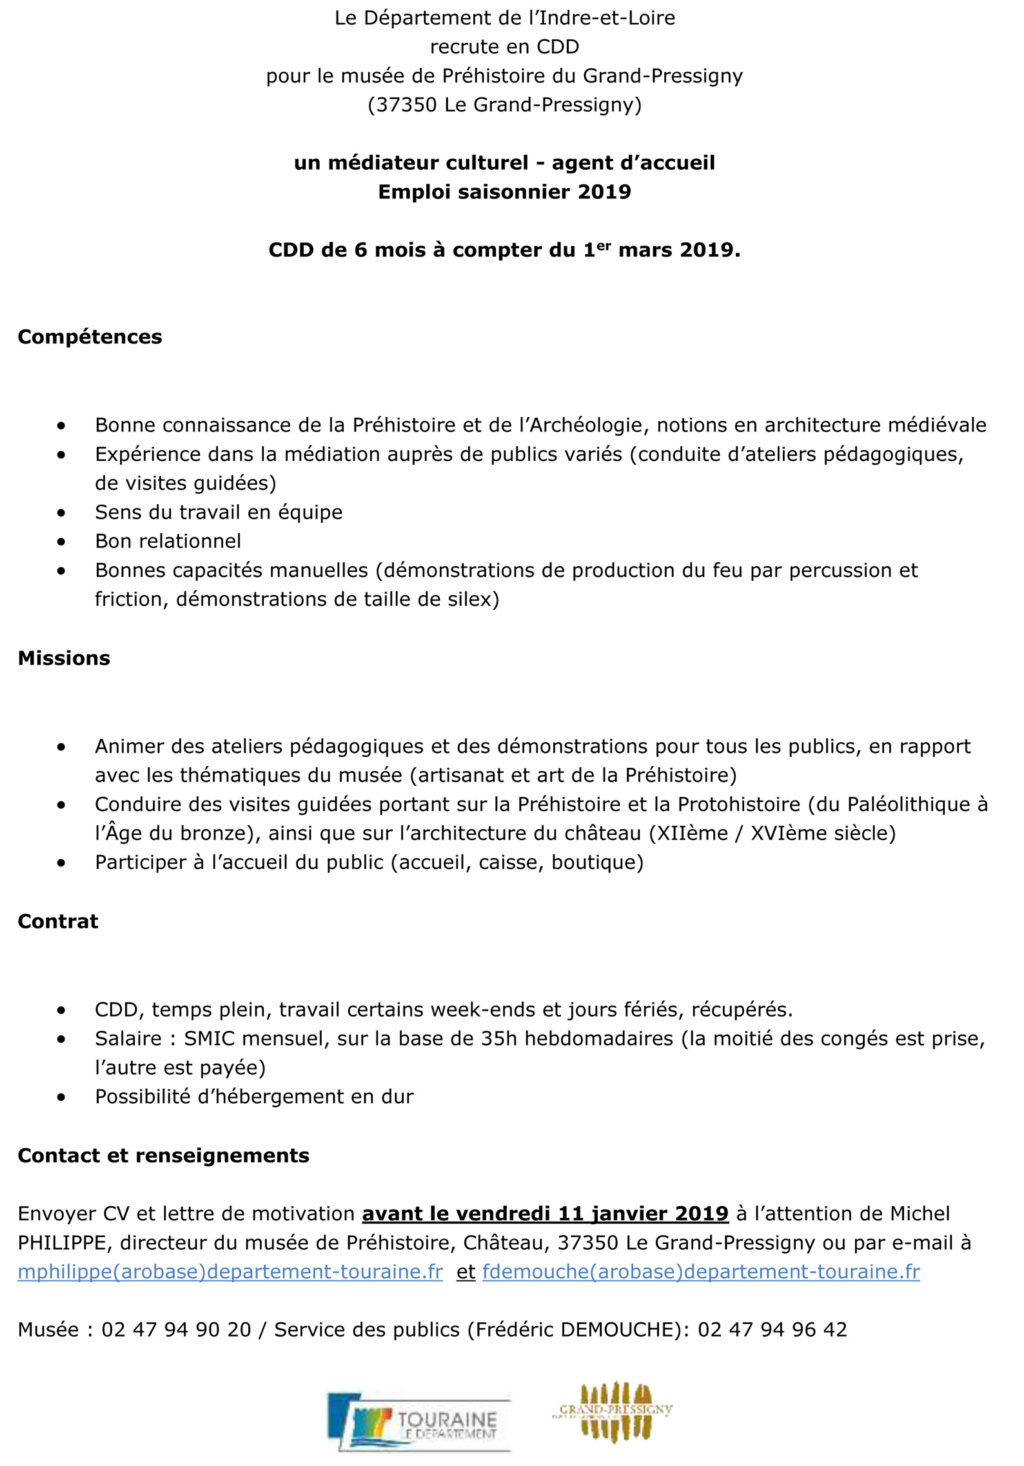 CDD médiation Musée du Grand-Pressigny (37) 2019 Cdd_me10